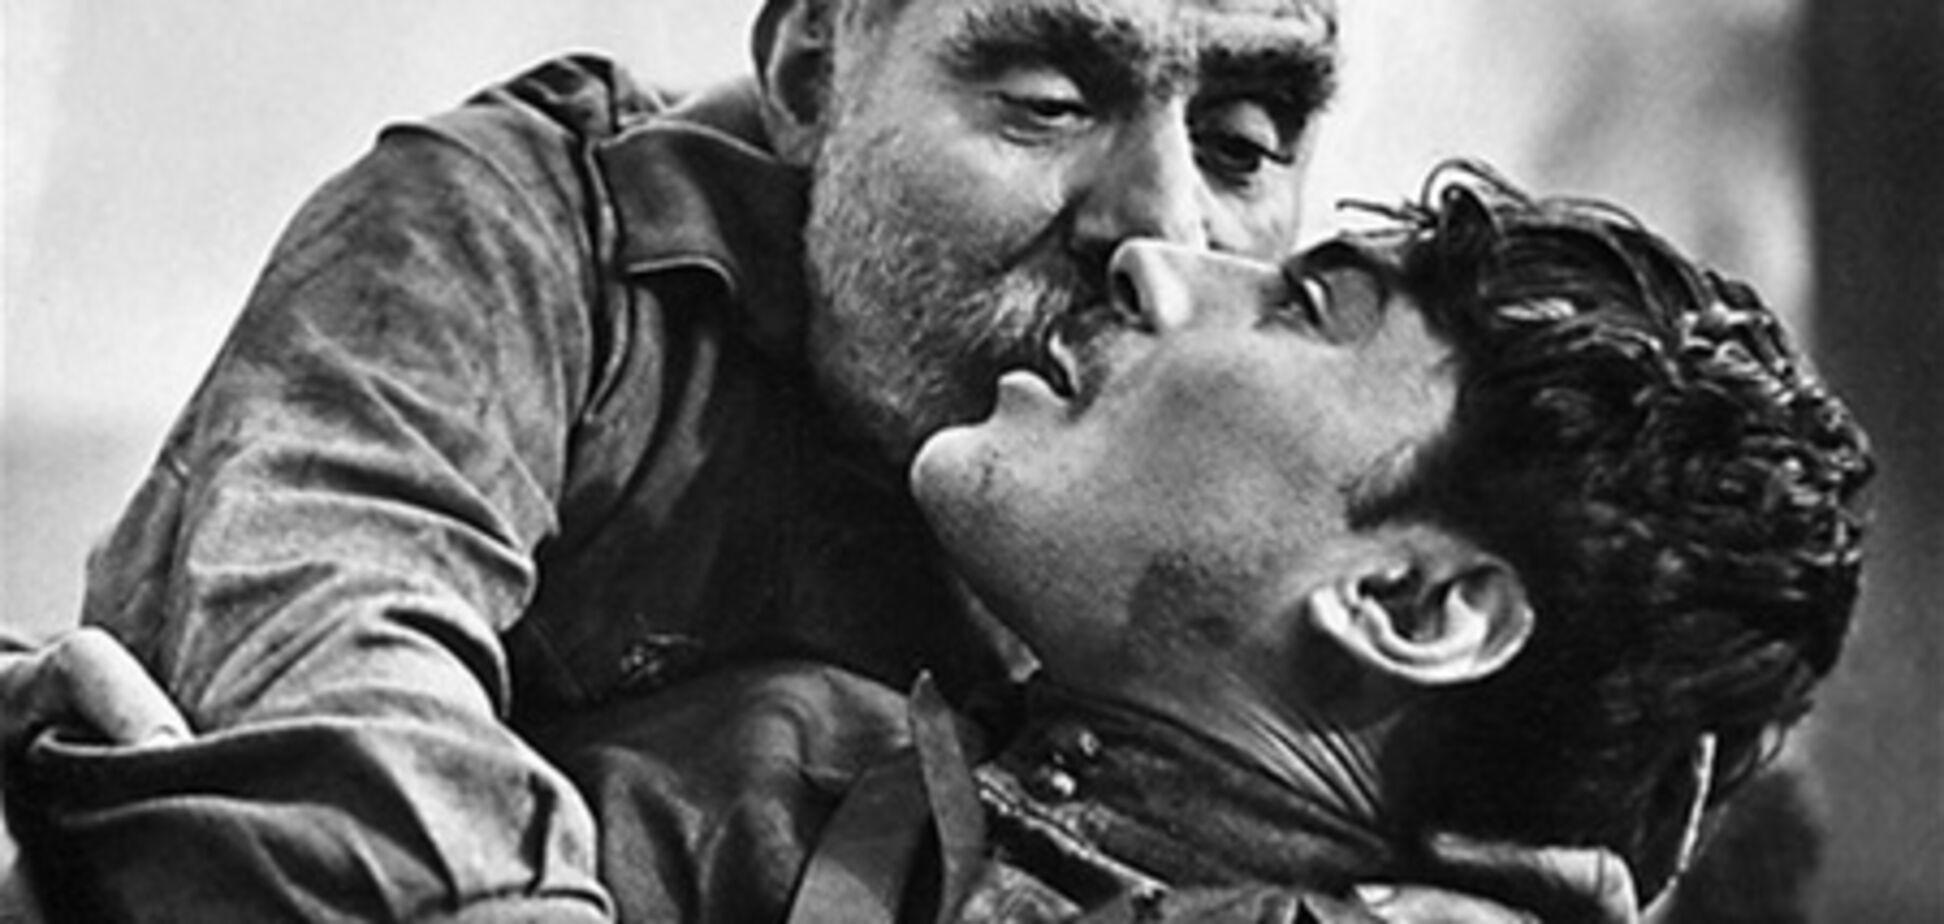 Бекмамбетову не дали снять римейк «Отца солдата»